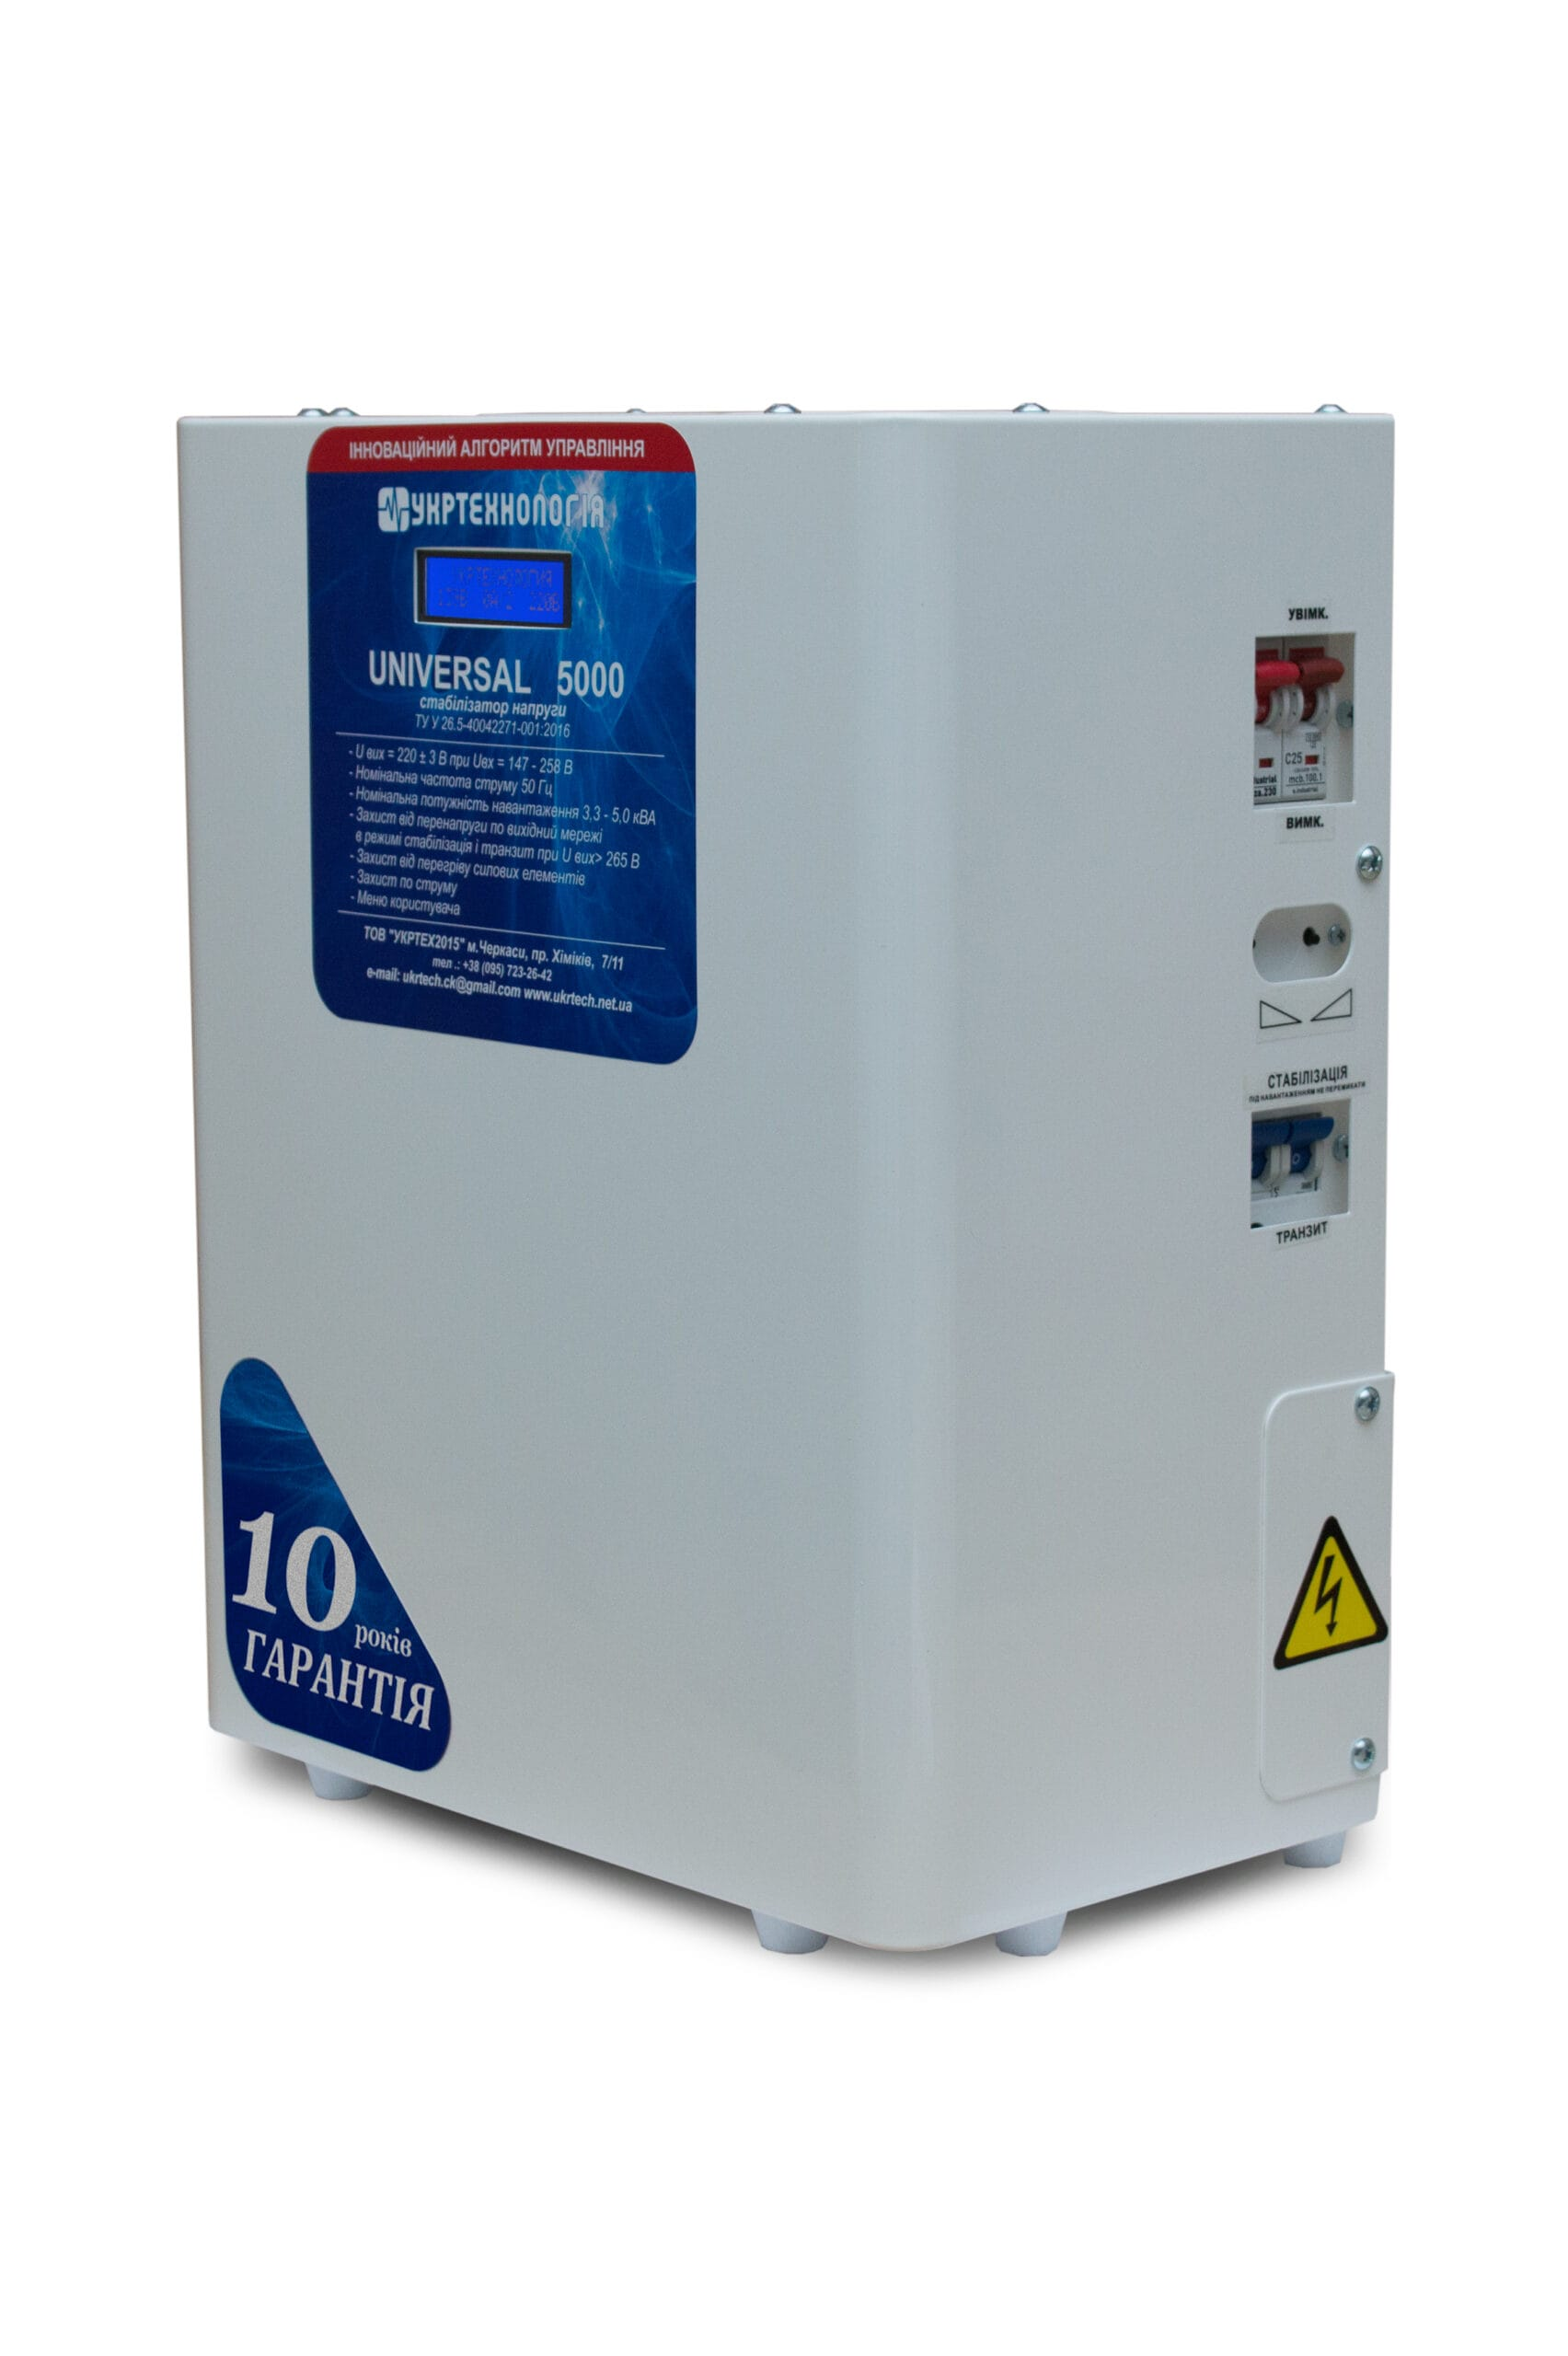 Стабилизаторы напряжения - Стабилизатор напряжения 5 кВт UNIVERSAL 000001417 - Фото 1